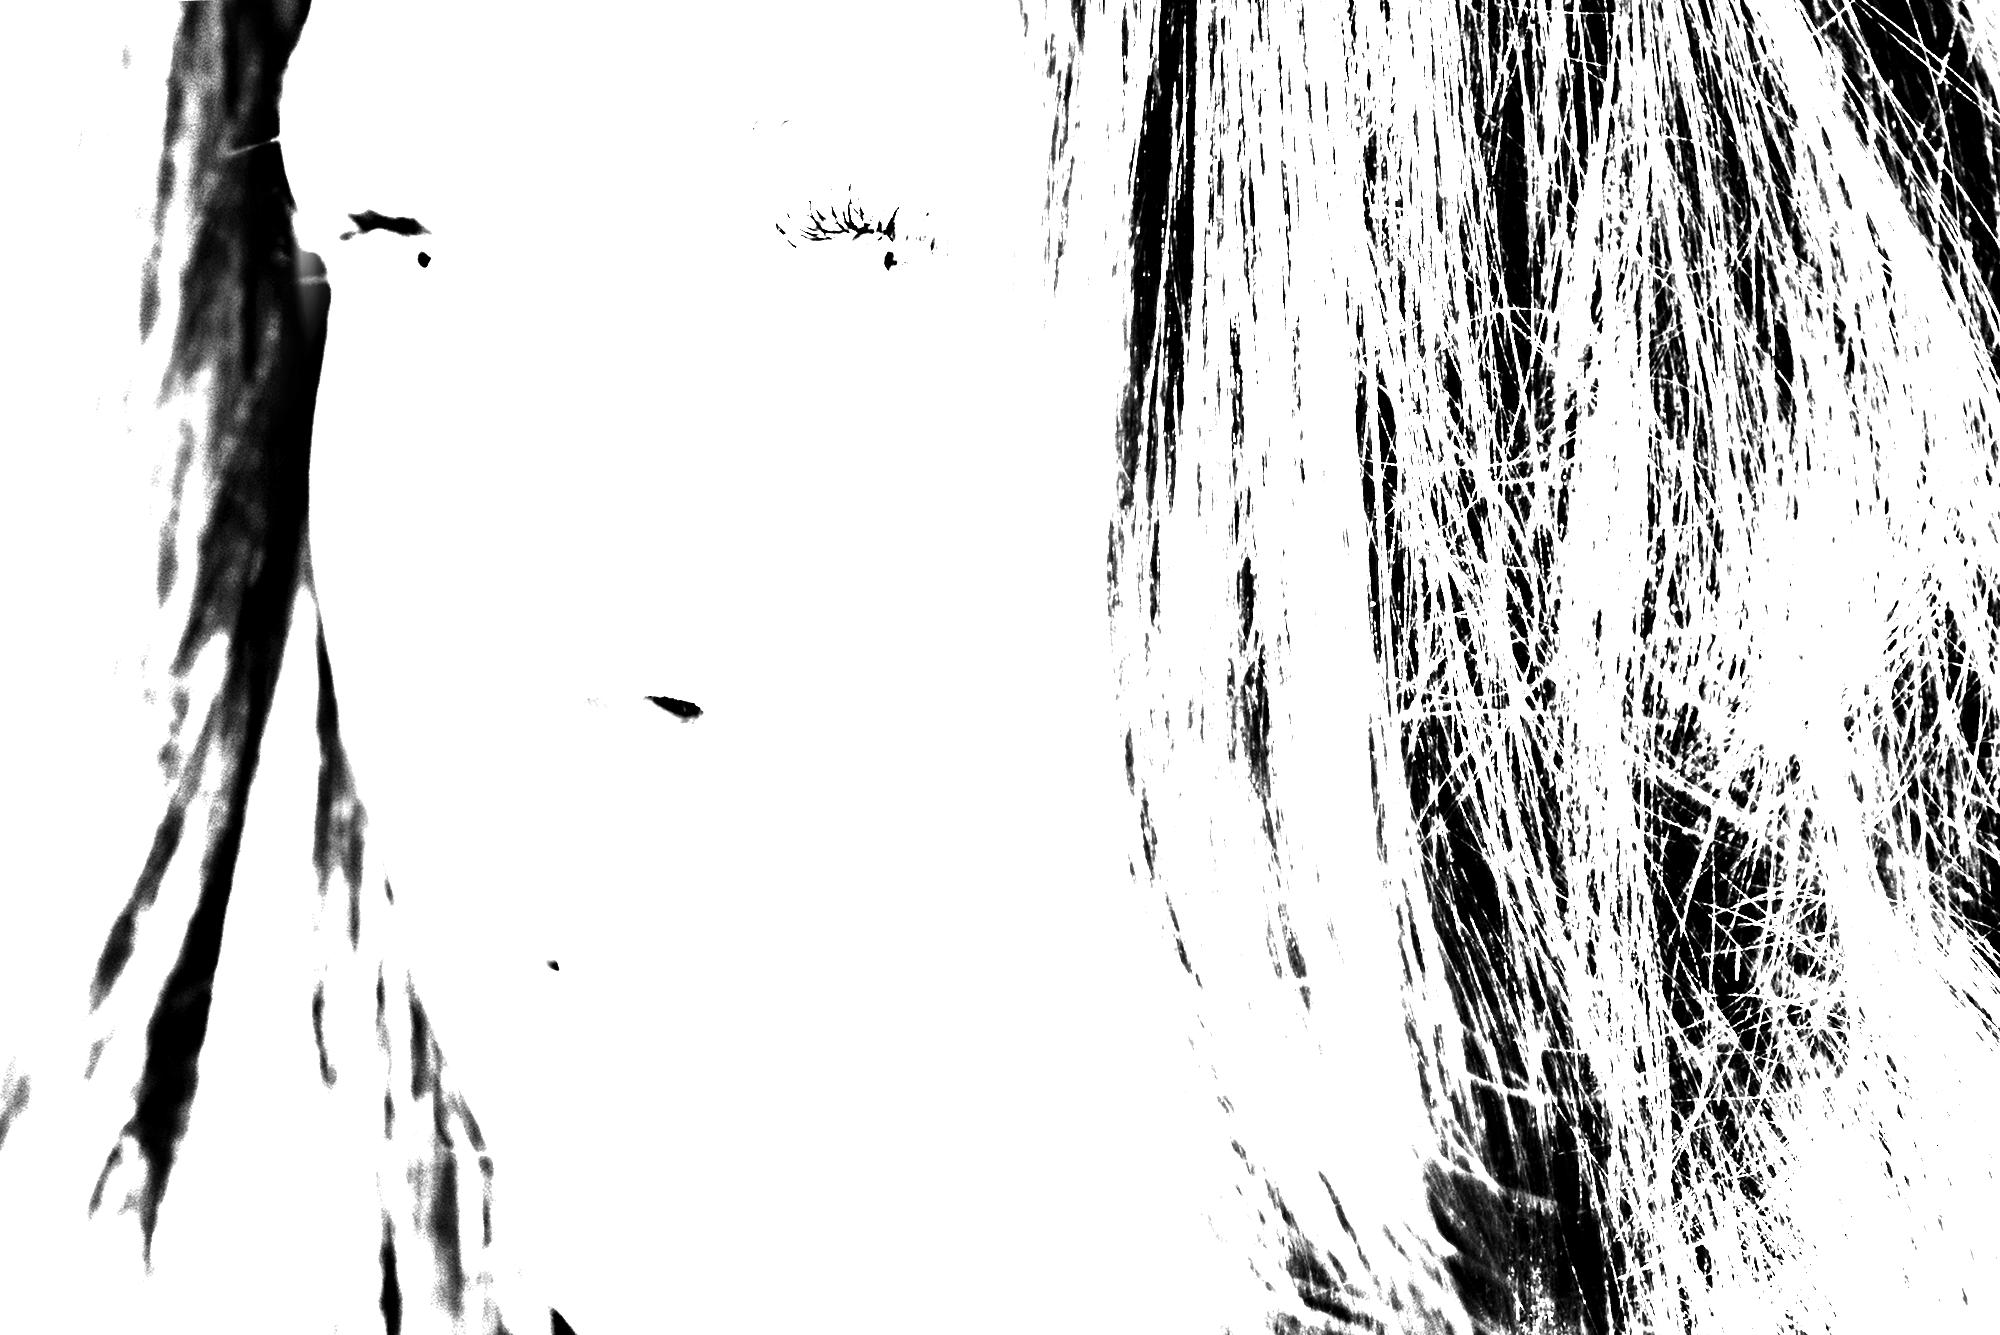 20161230-DSC_0978.png